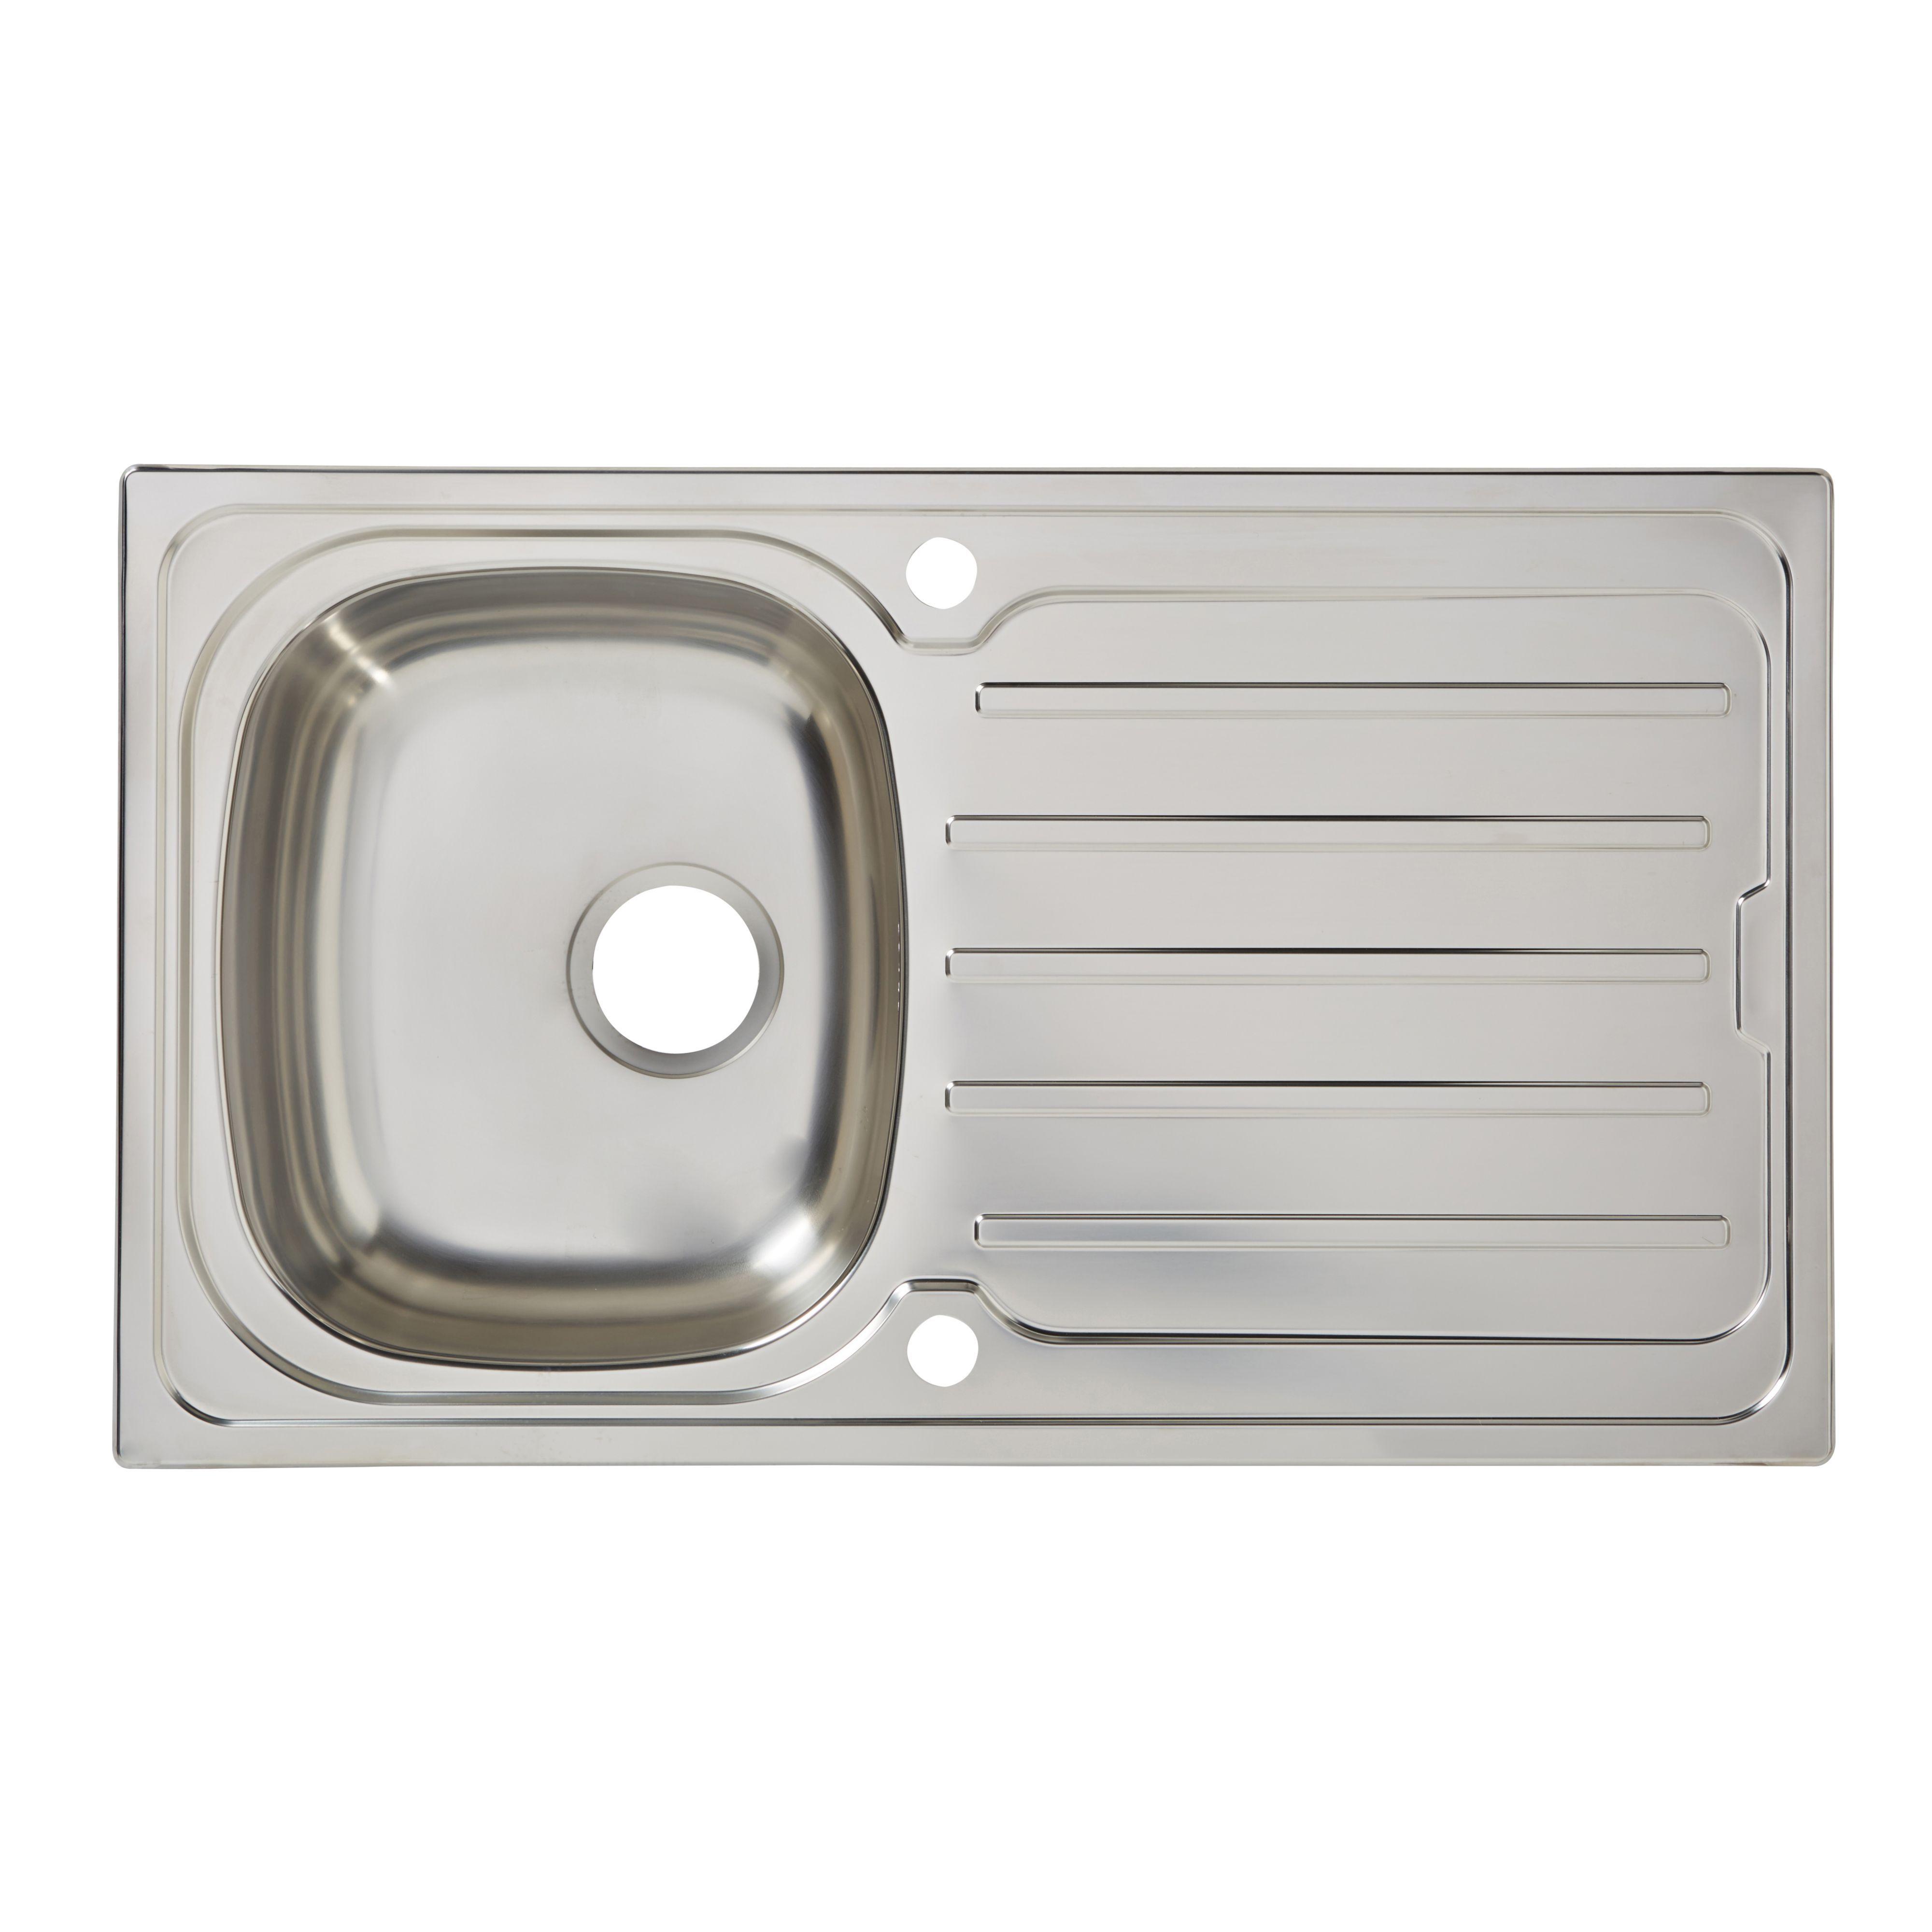 Cooke & Lewis Nakaya 1 Bowl Polished Stainless Steel Sink & Drainer